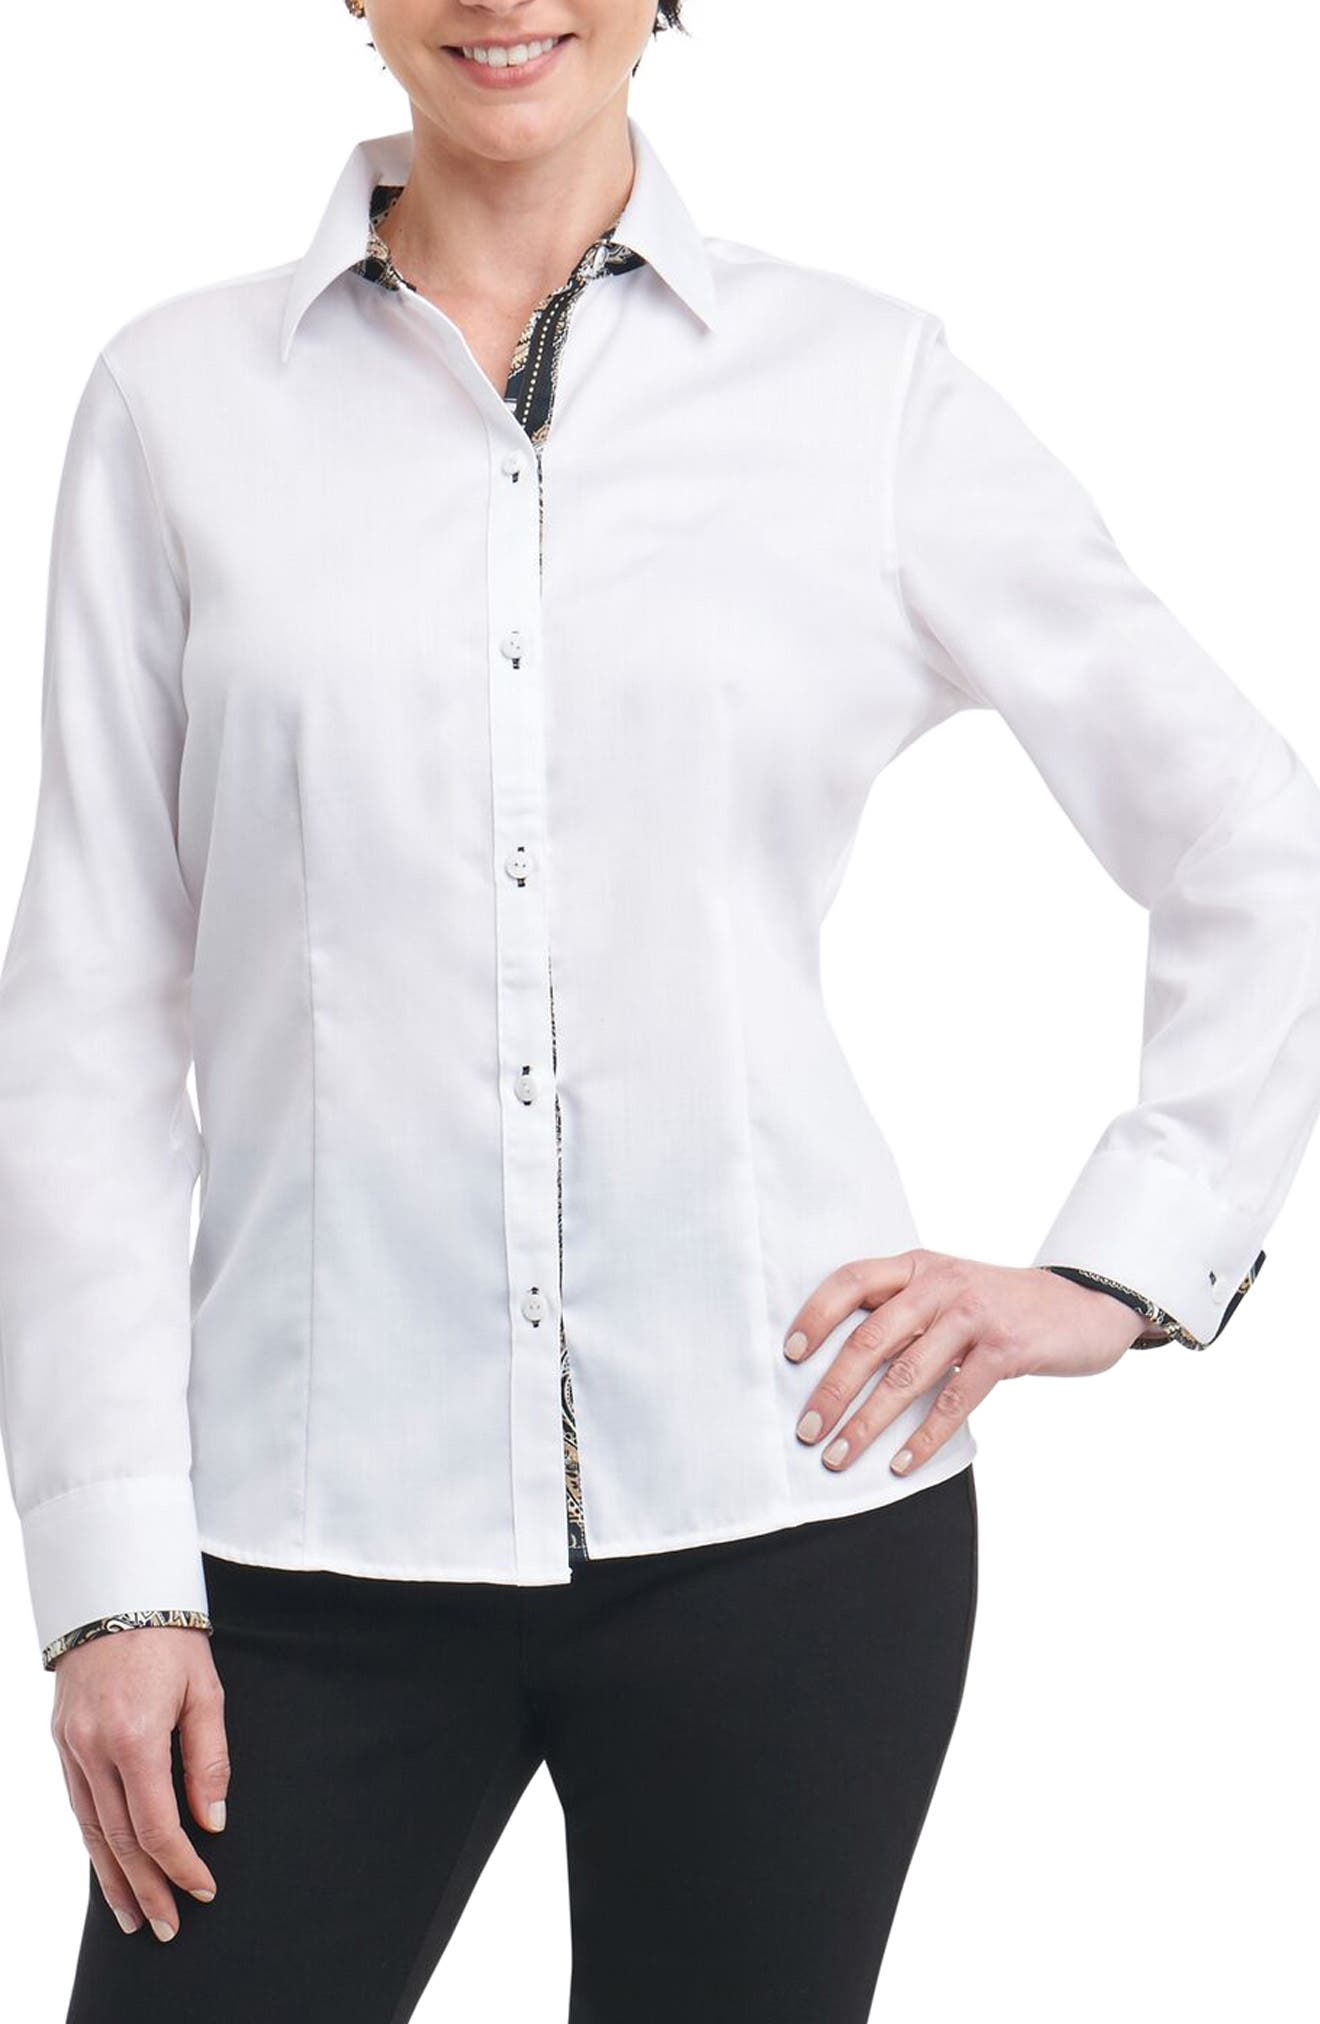 Brooke Contrast Trim Sateen Shirt,                         Main,                         color, White